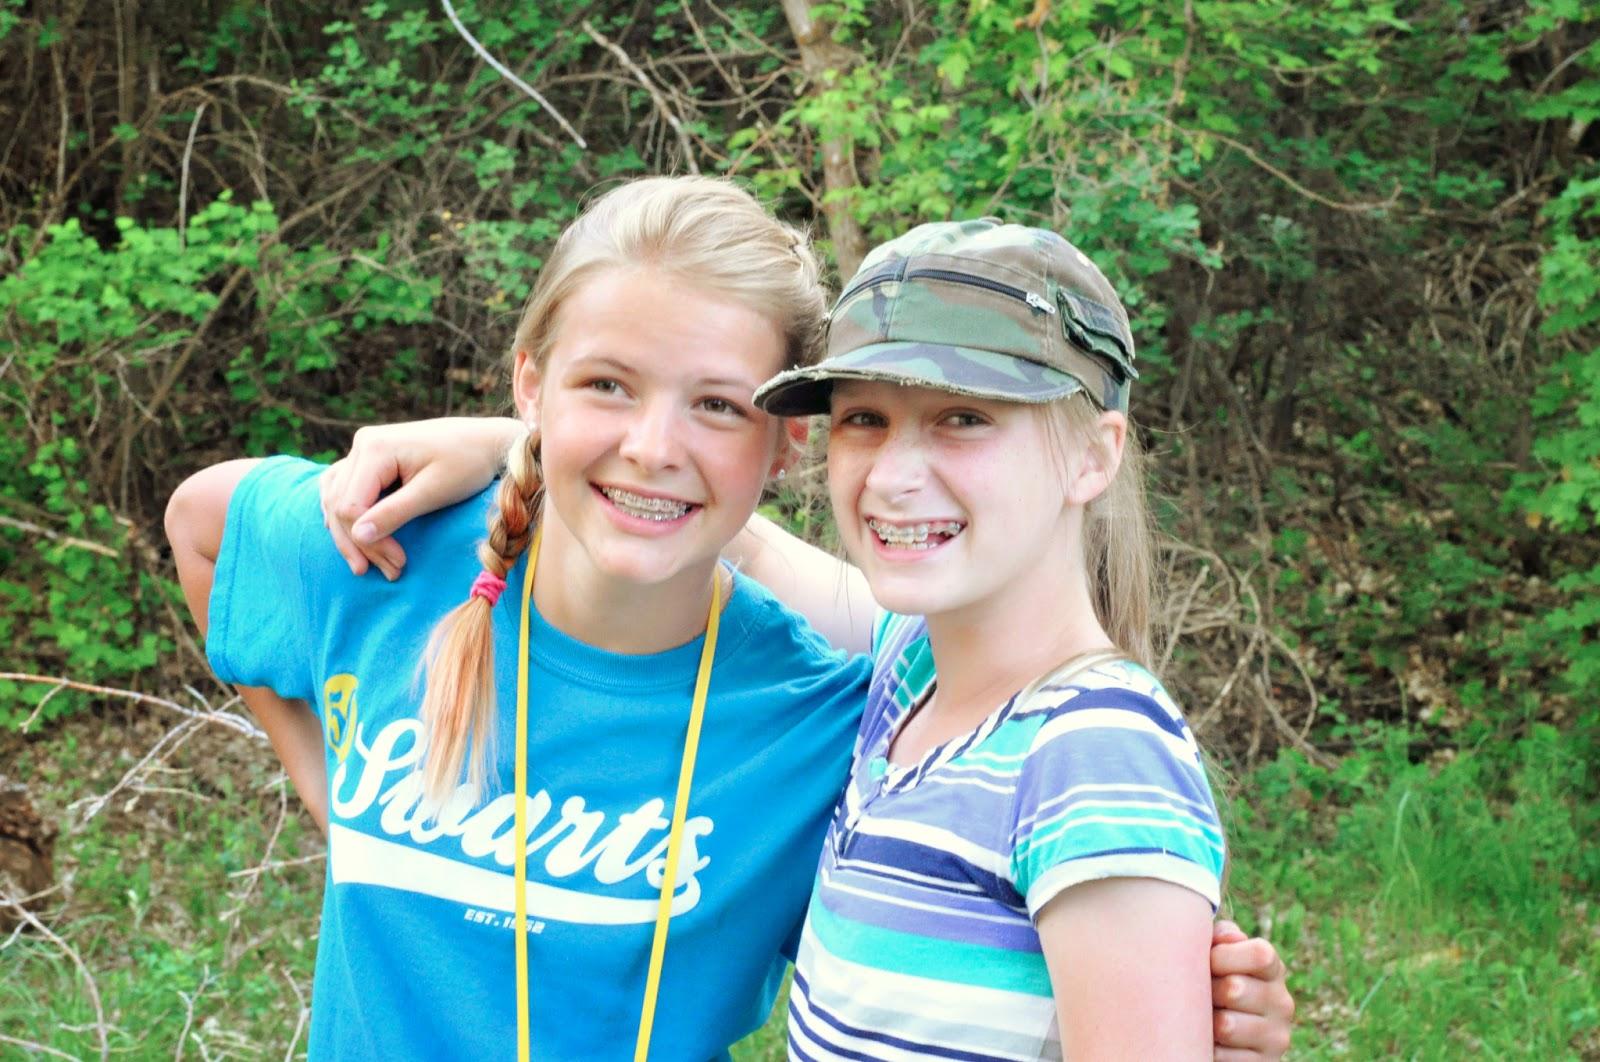 duct tape girls camp crafts {ideas}   Little Birdie Secrets